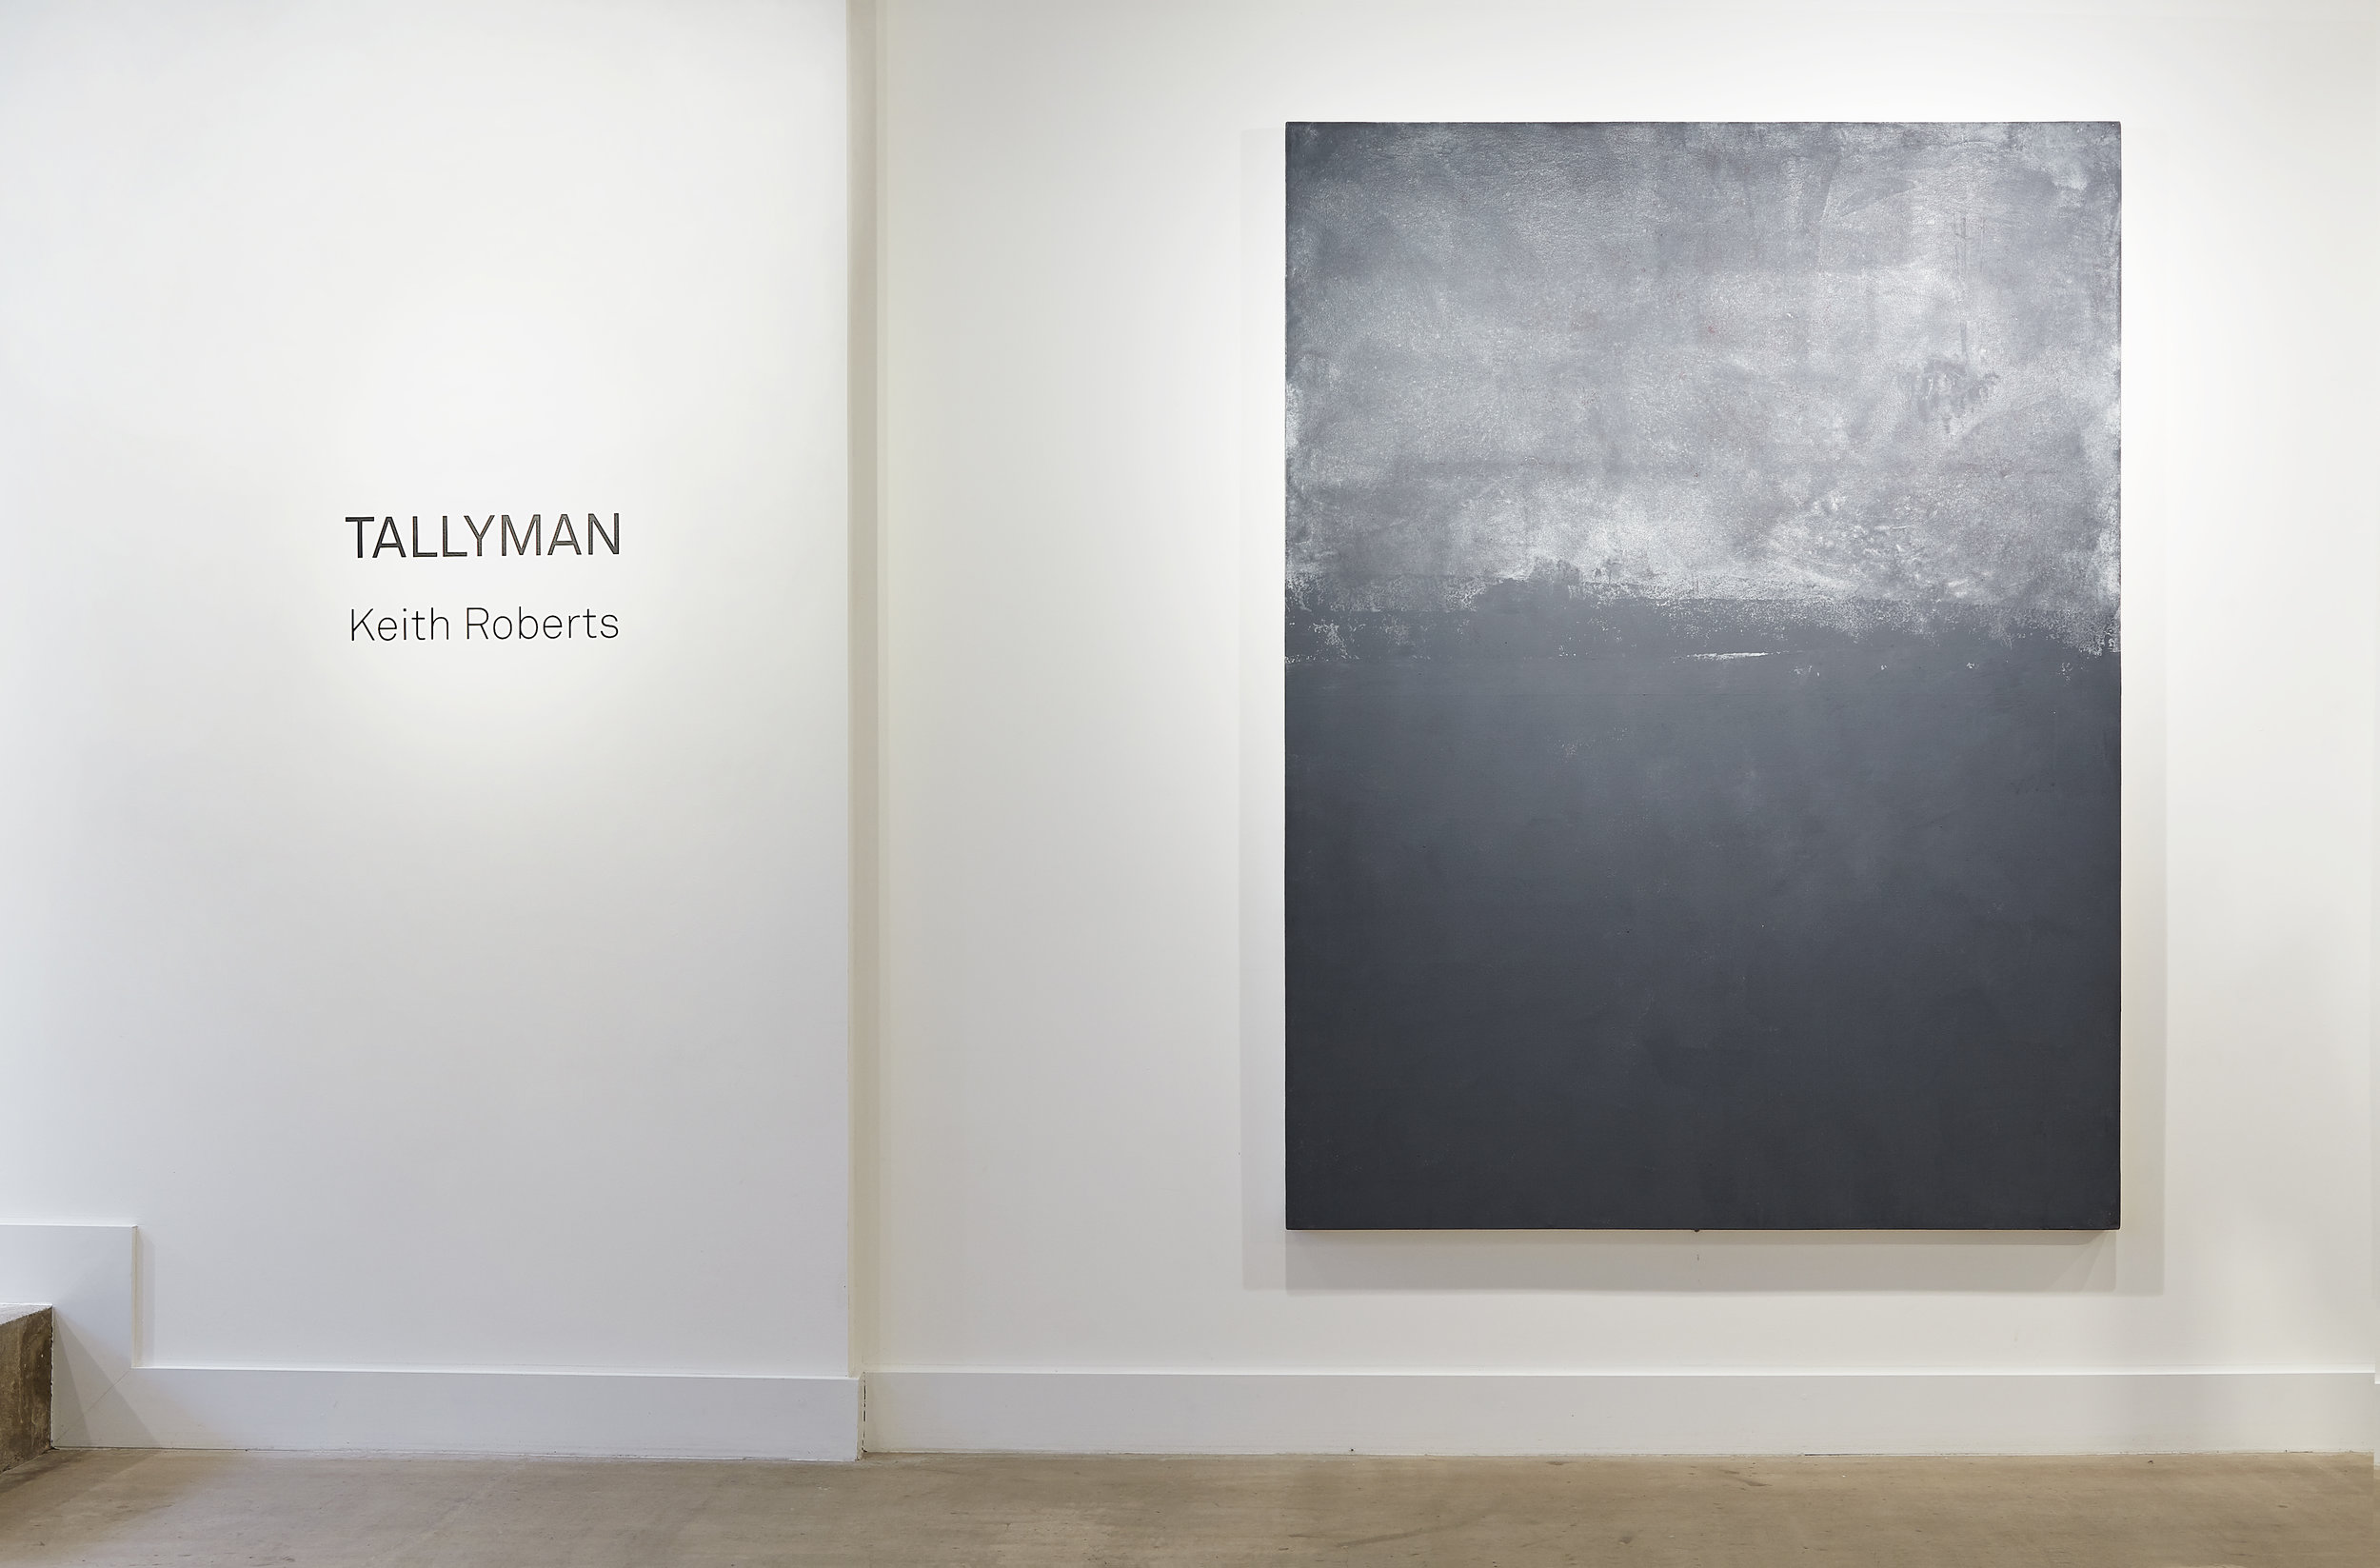 Copy of TALLYMAN, Keith Roberts, No 20